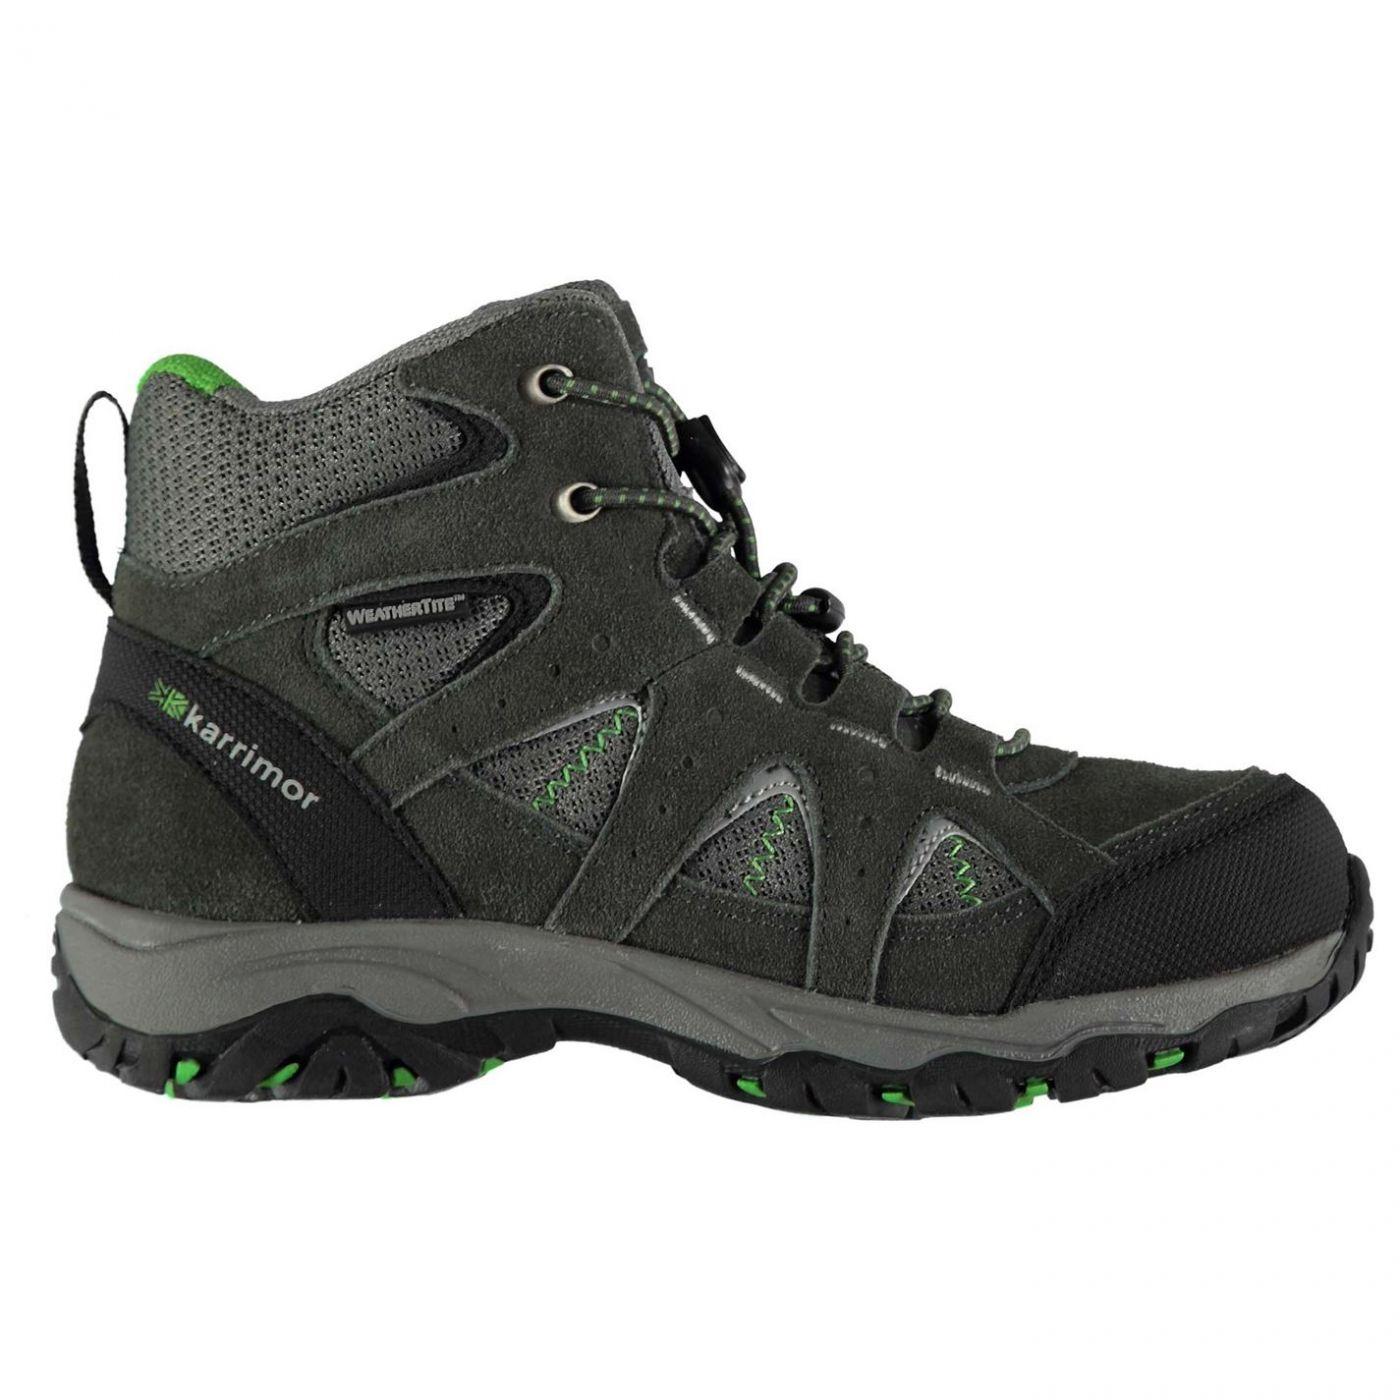 Karrimor Mount Mid Childrens Waterproof Walking Shoes